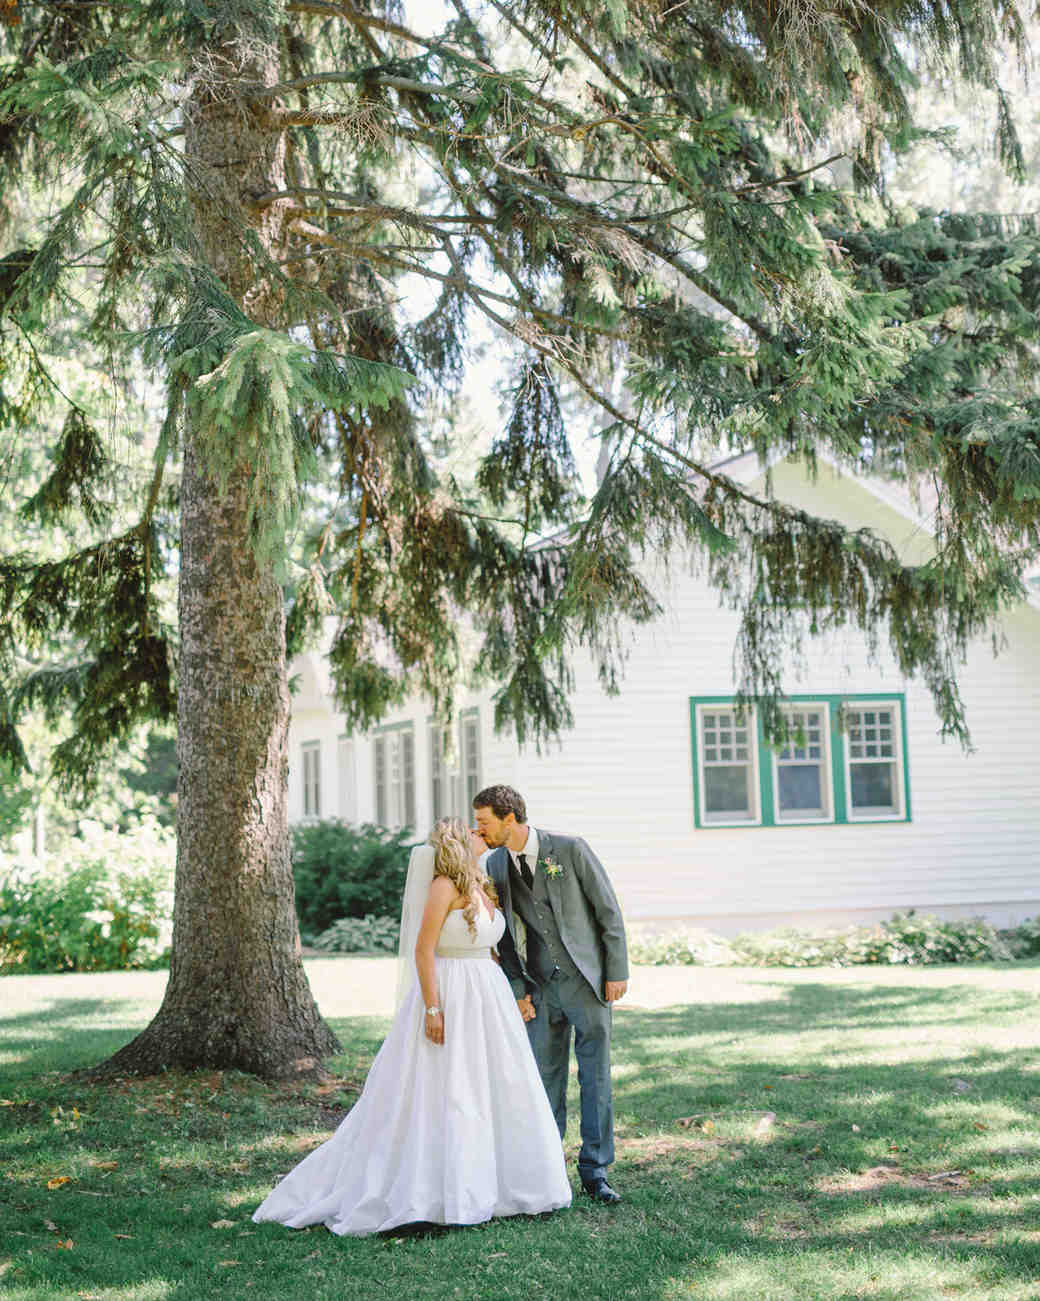 lizzy-bucky-wedding-couple-248-s111857-0315.jpg